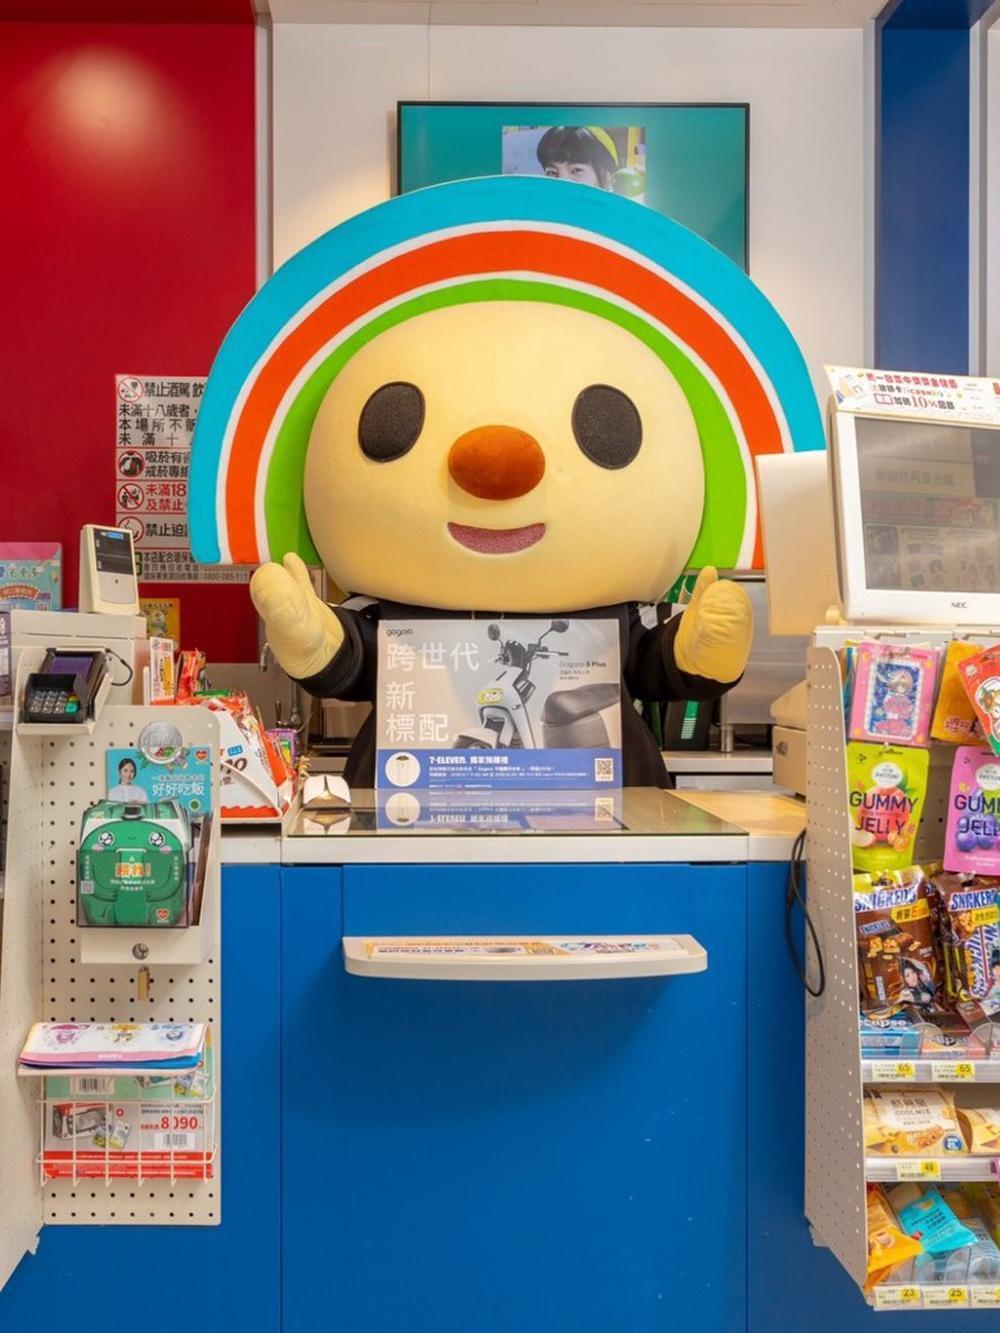 Gogoro 銷售管道再出奇招,特別與全台超過 5,500 家門市的 7-ELEVEN 攜手合作,推出獨家 Gogoro 3 Plus 新色「芝麻灰」預購活動。